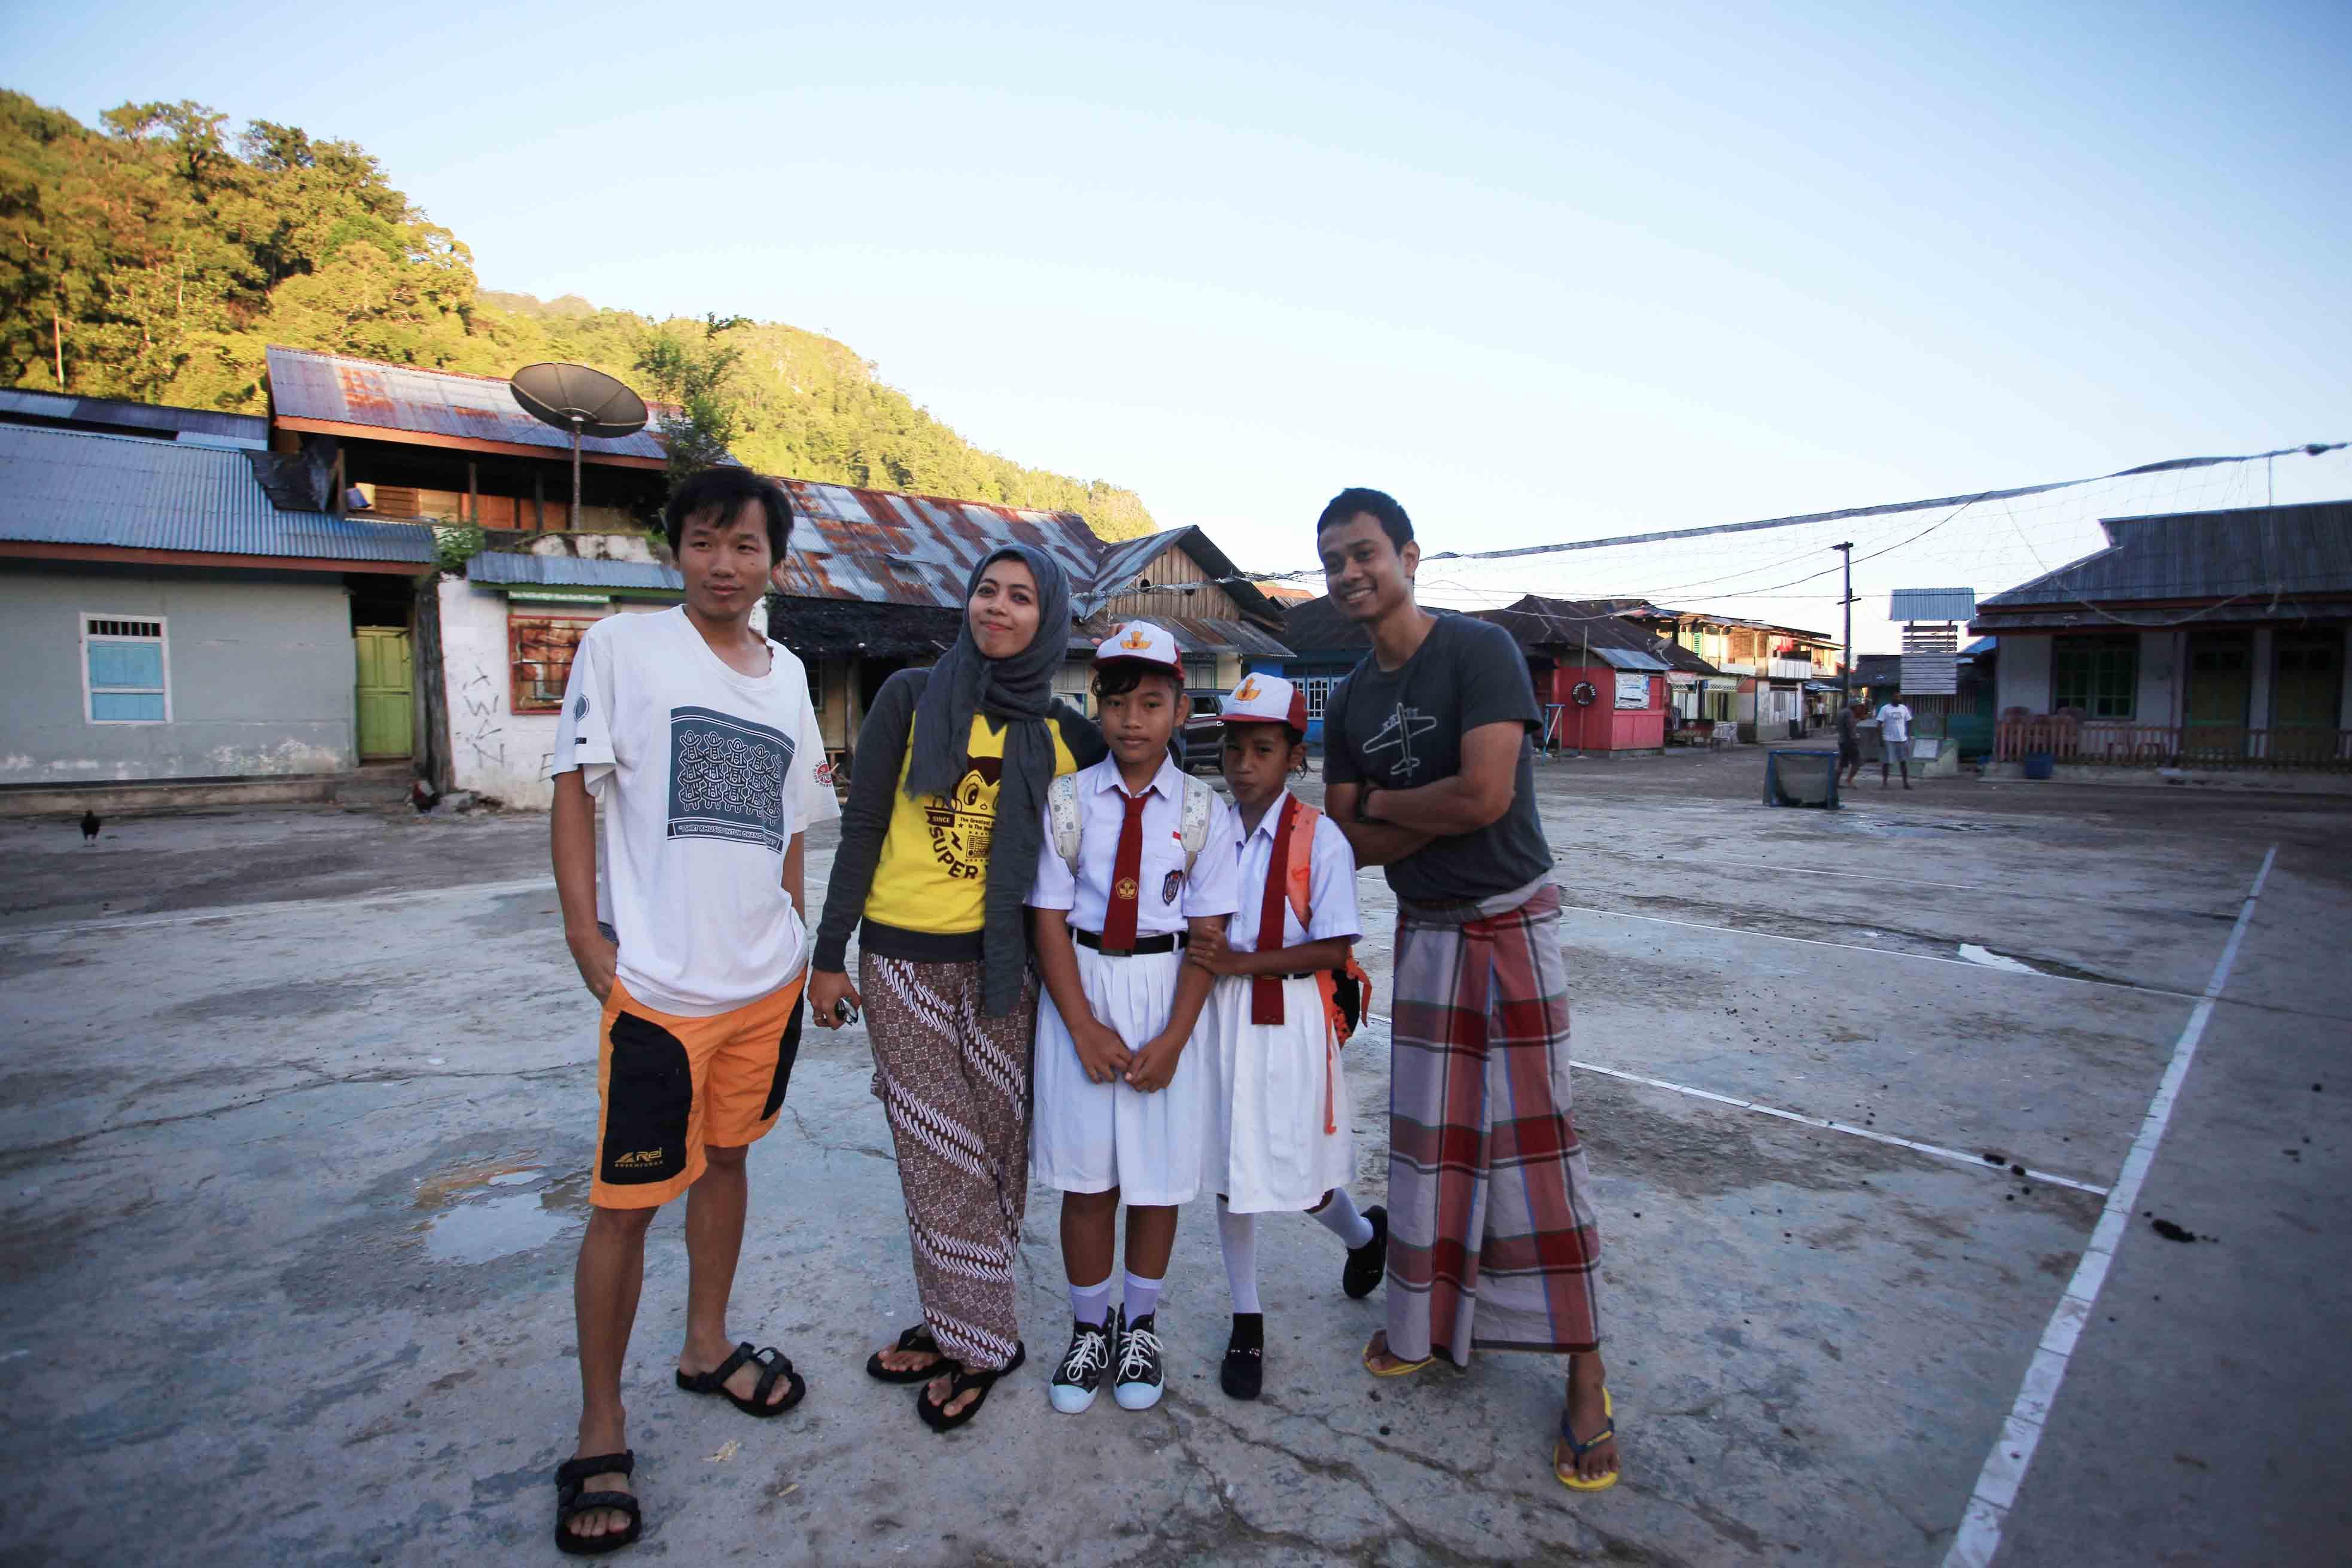 Teman-teman berfoto bersama anak-anak Sawai